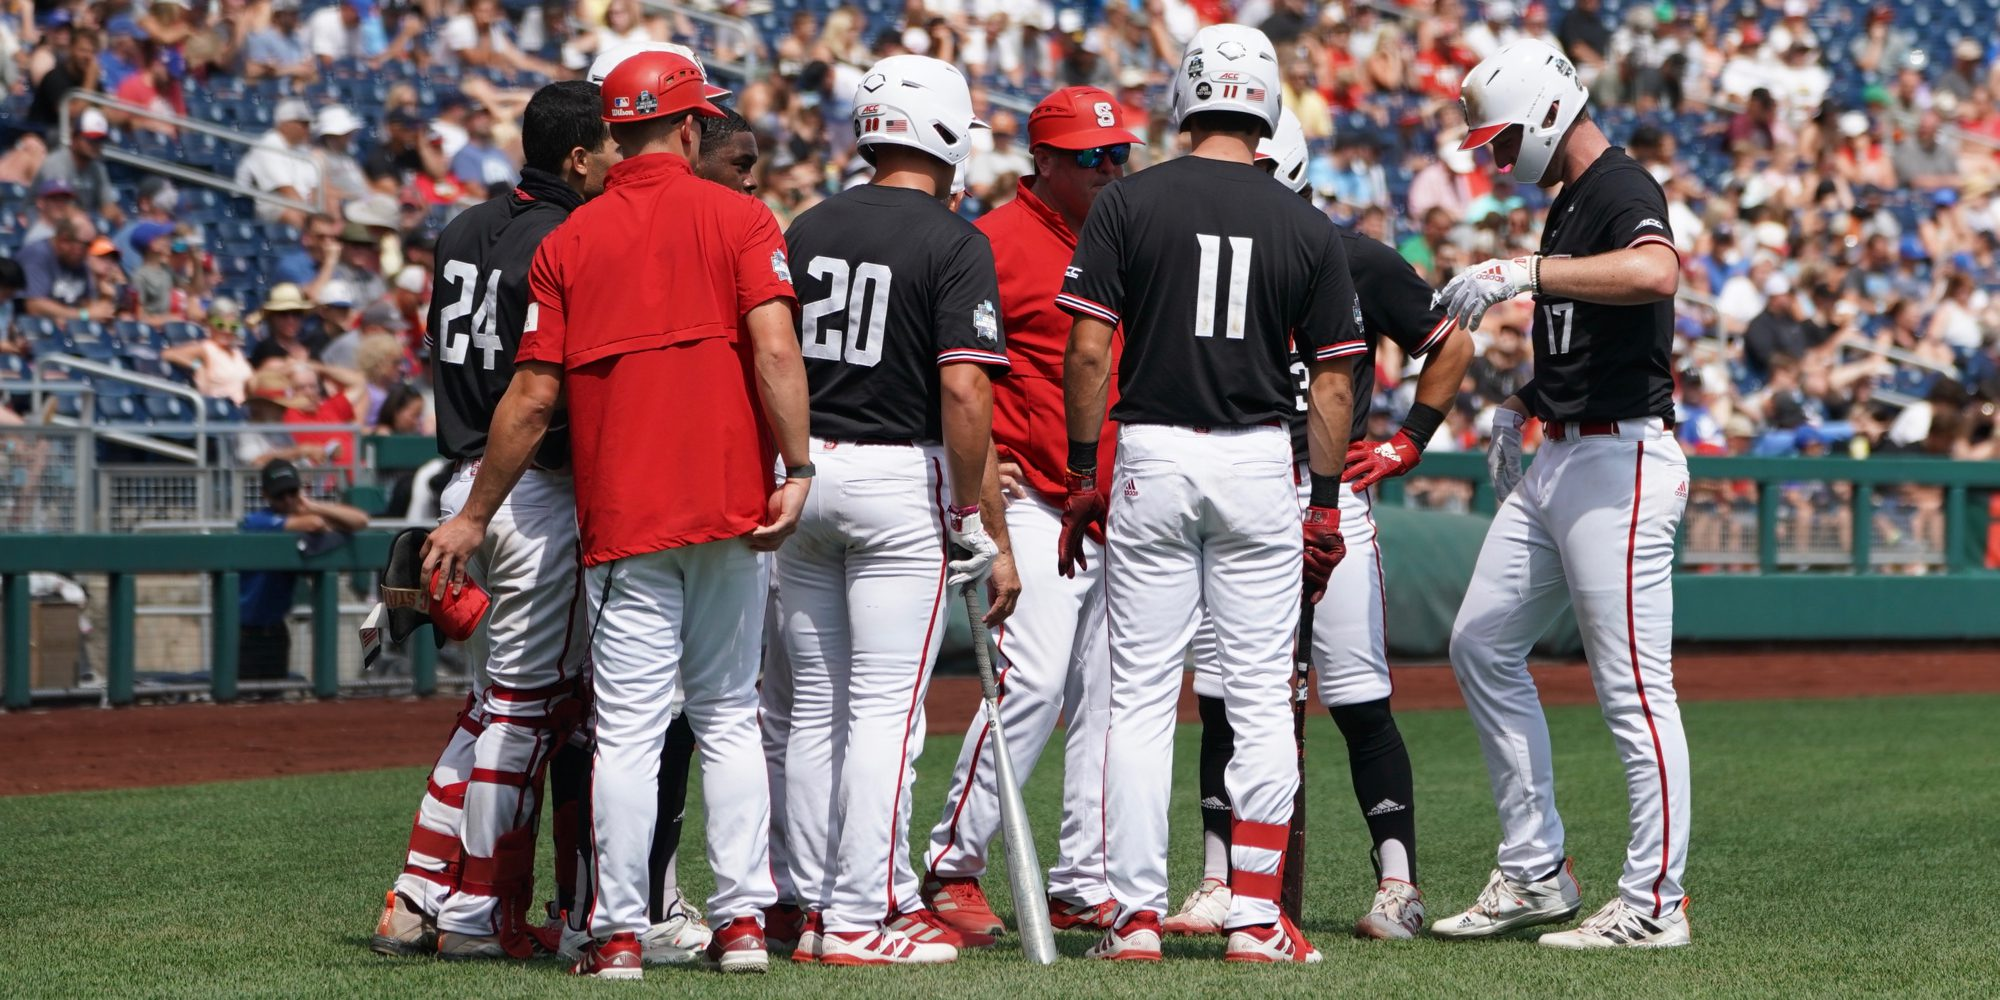 NC State Is Out: Vanderbilt Advances To CWS Finals Via 'No Contest' • D1Baseball